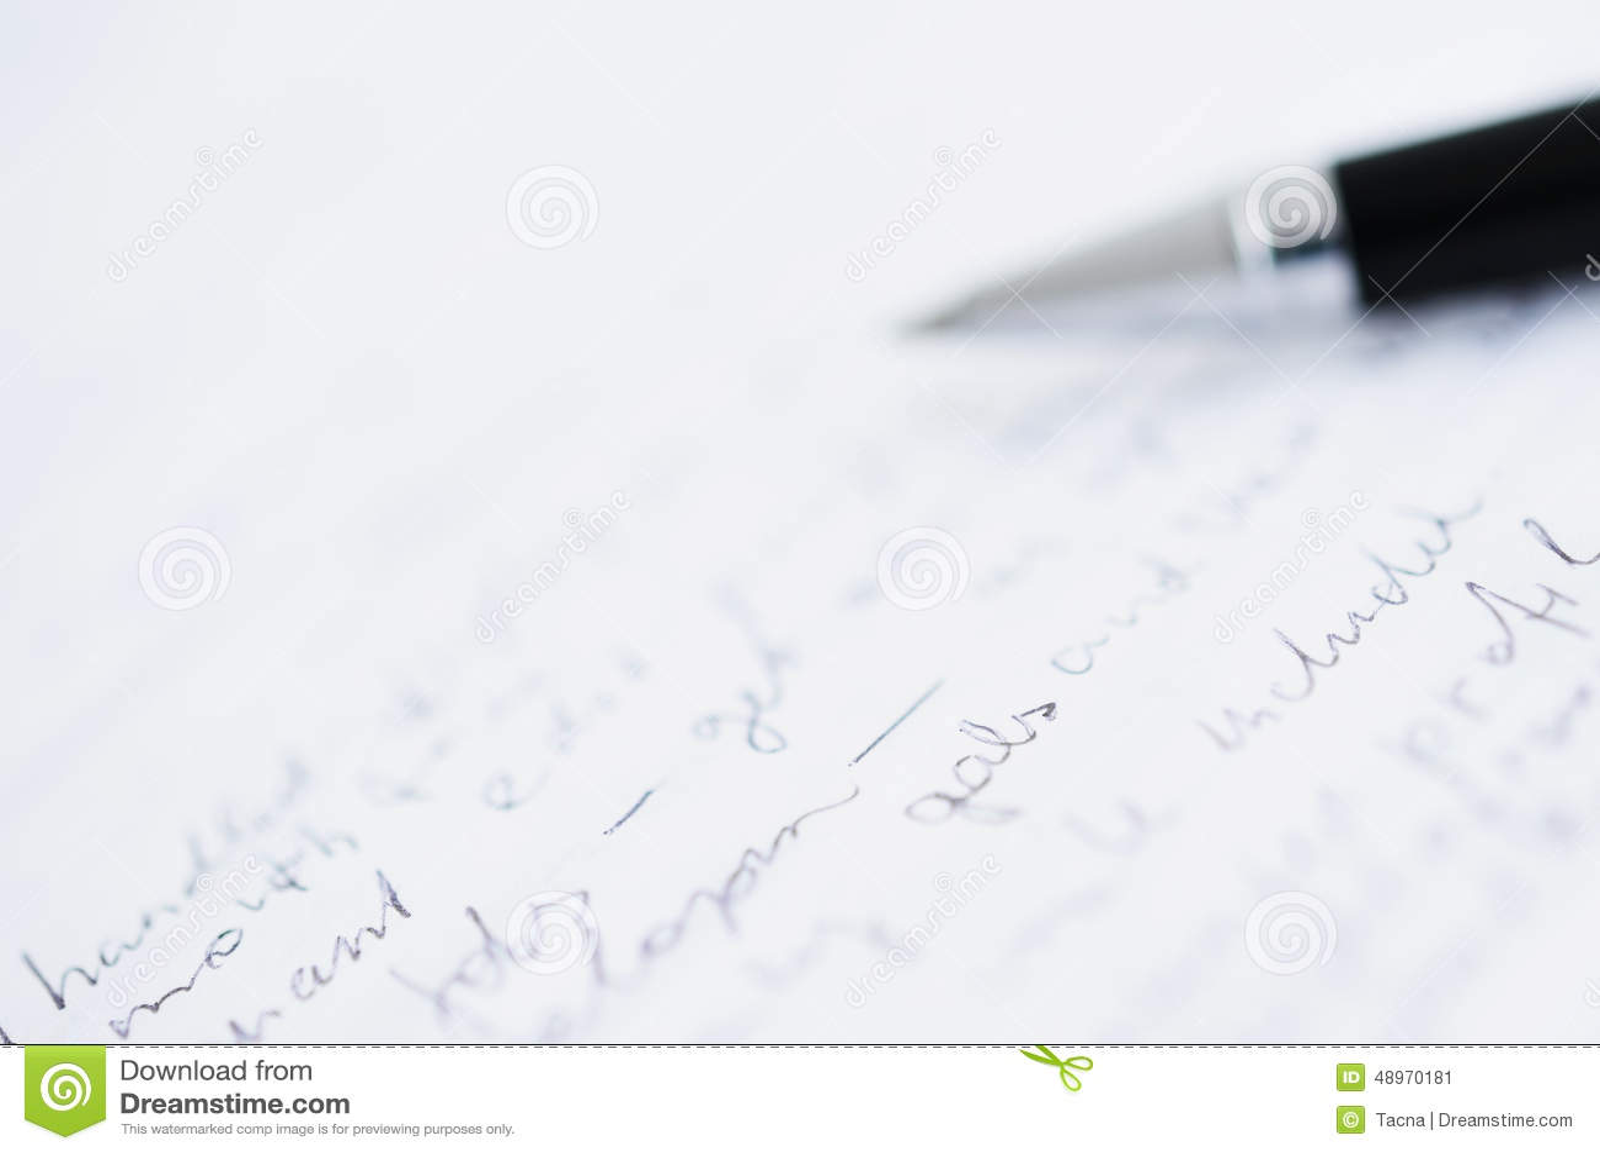 College writing help